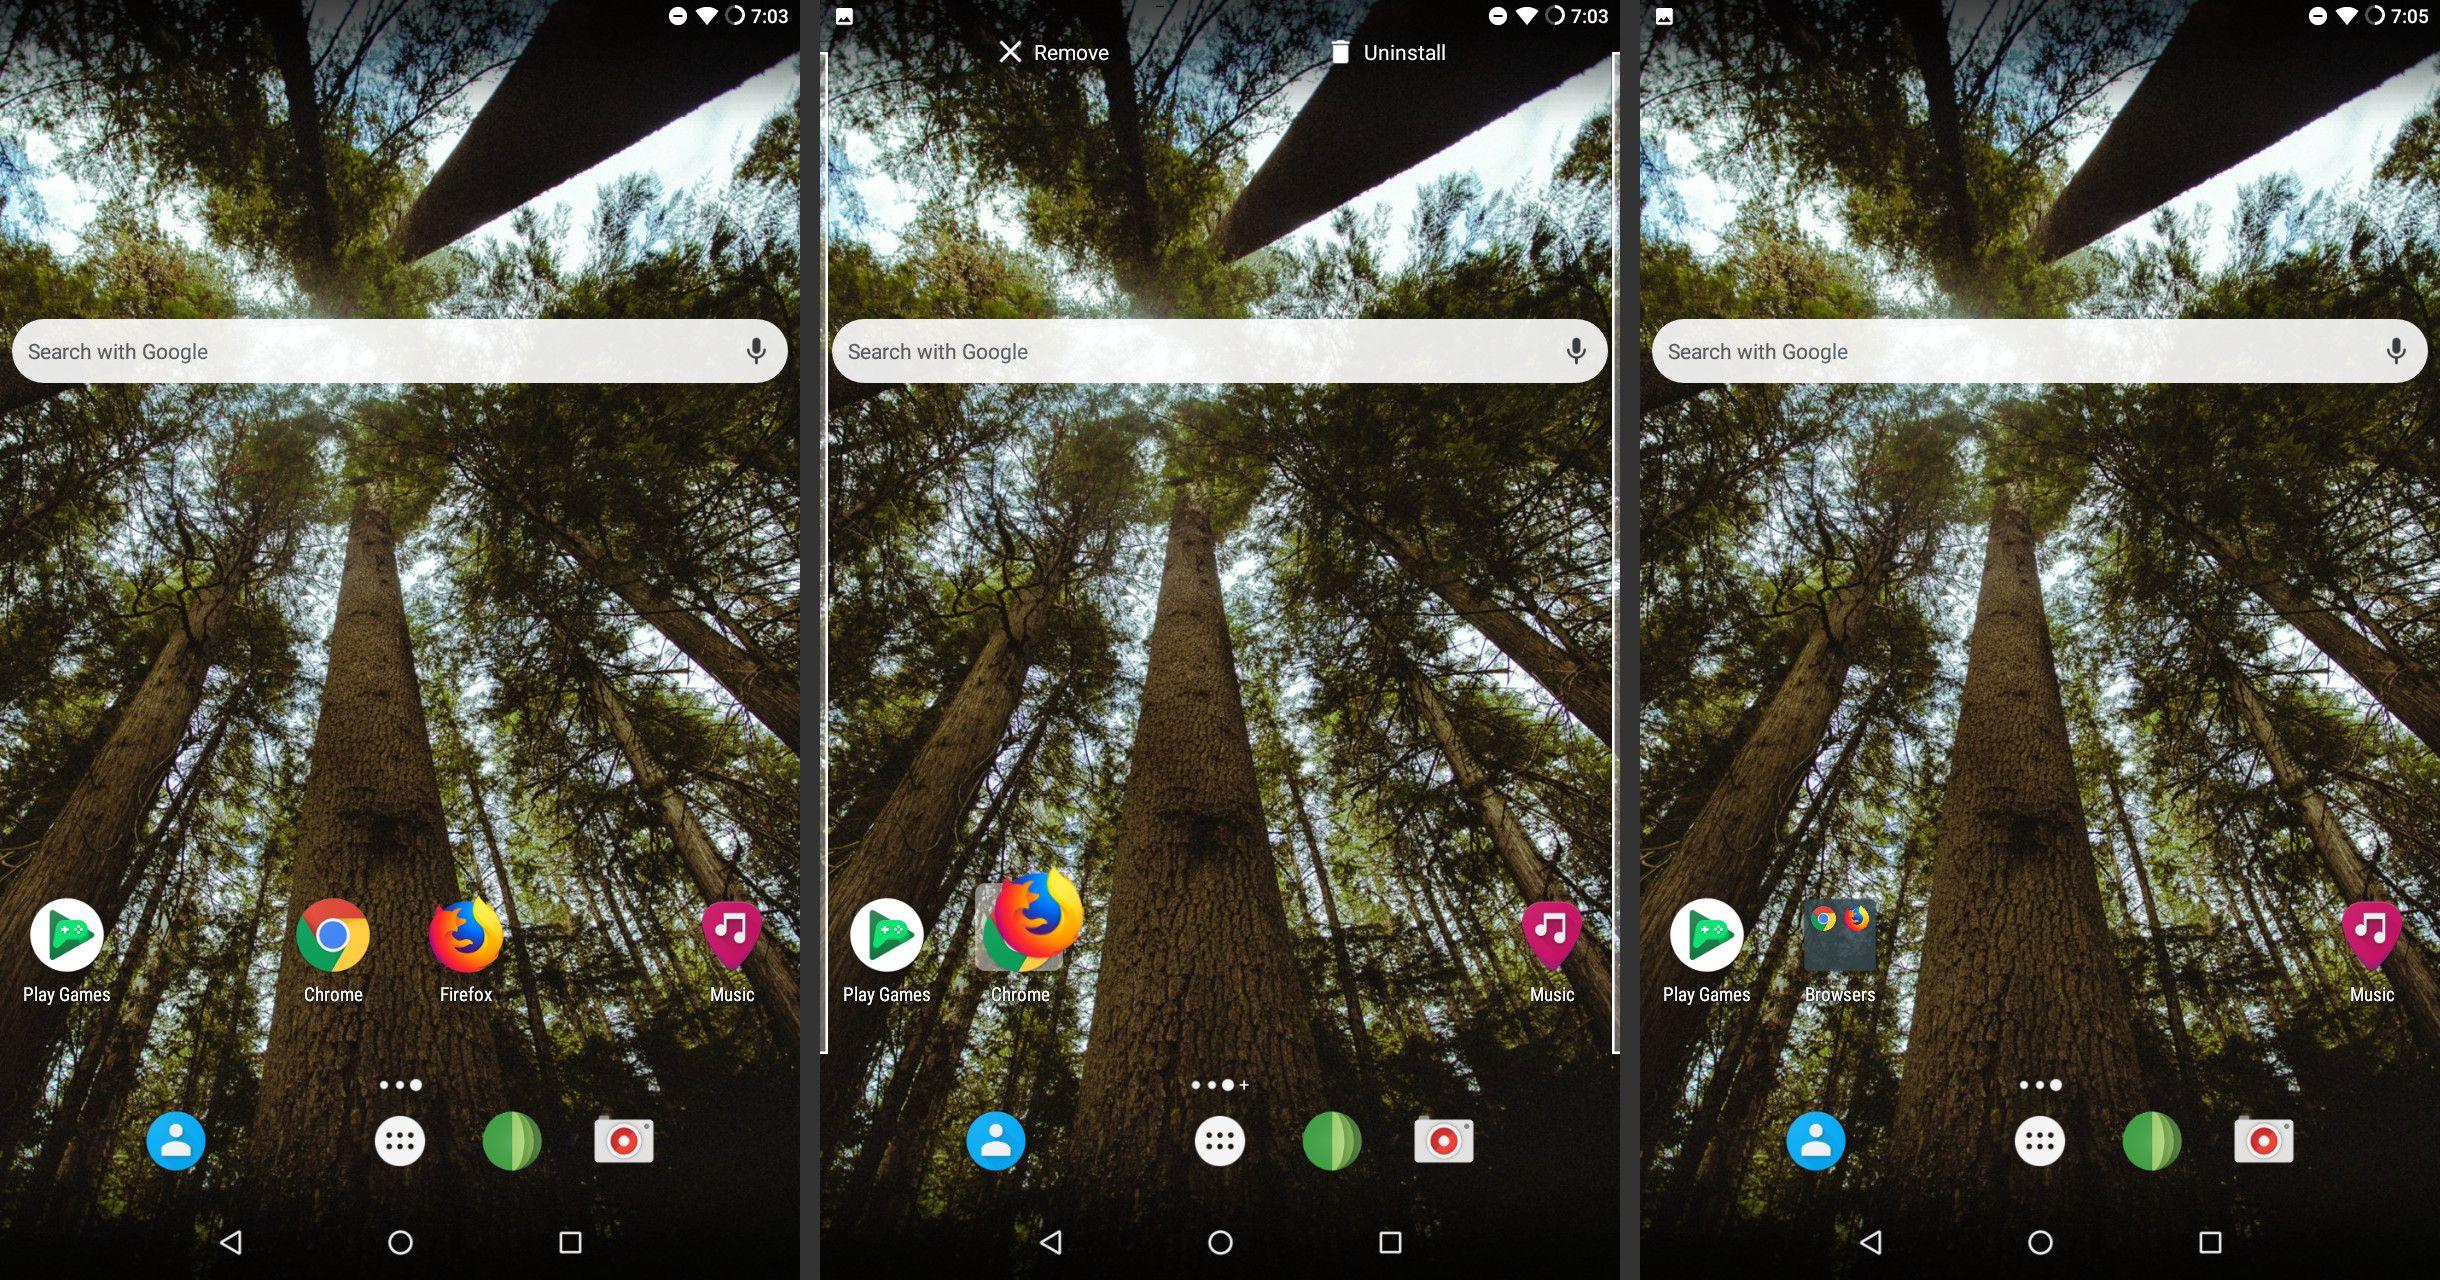 Android create app folder